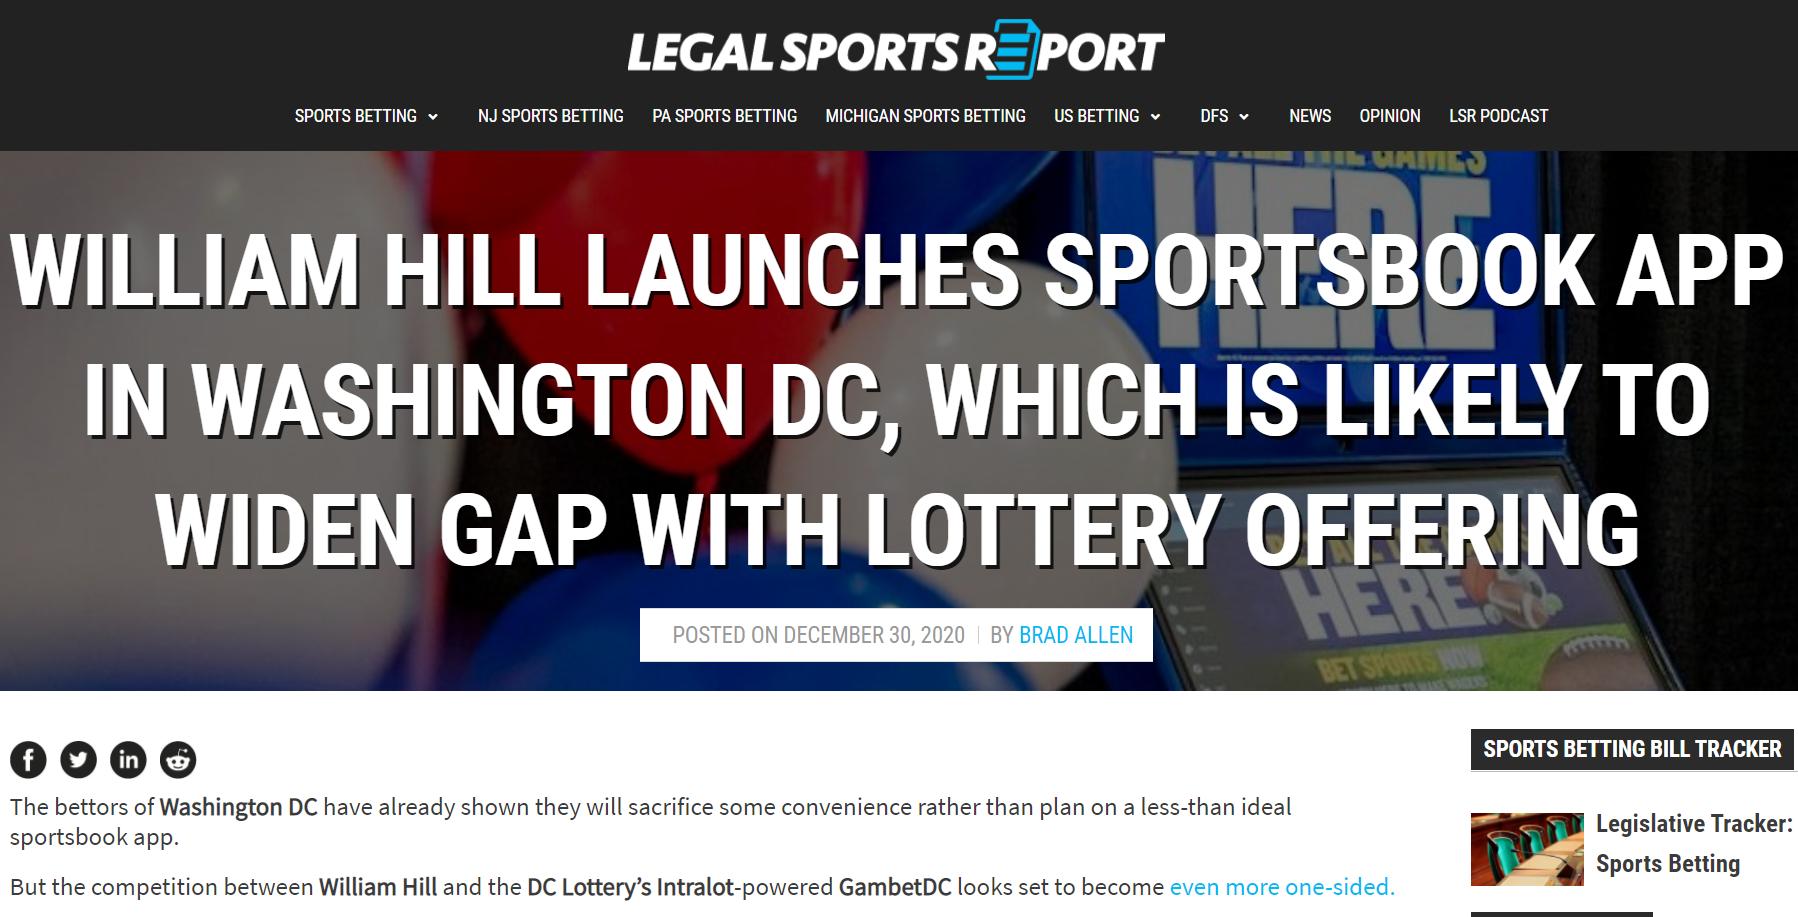 Daniel Kustelski Weighs in on Washington DC Sports Betting with L